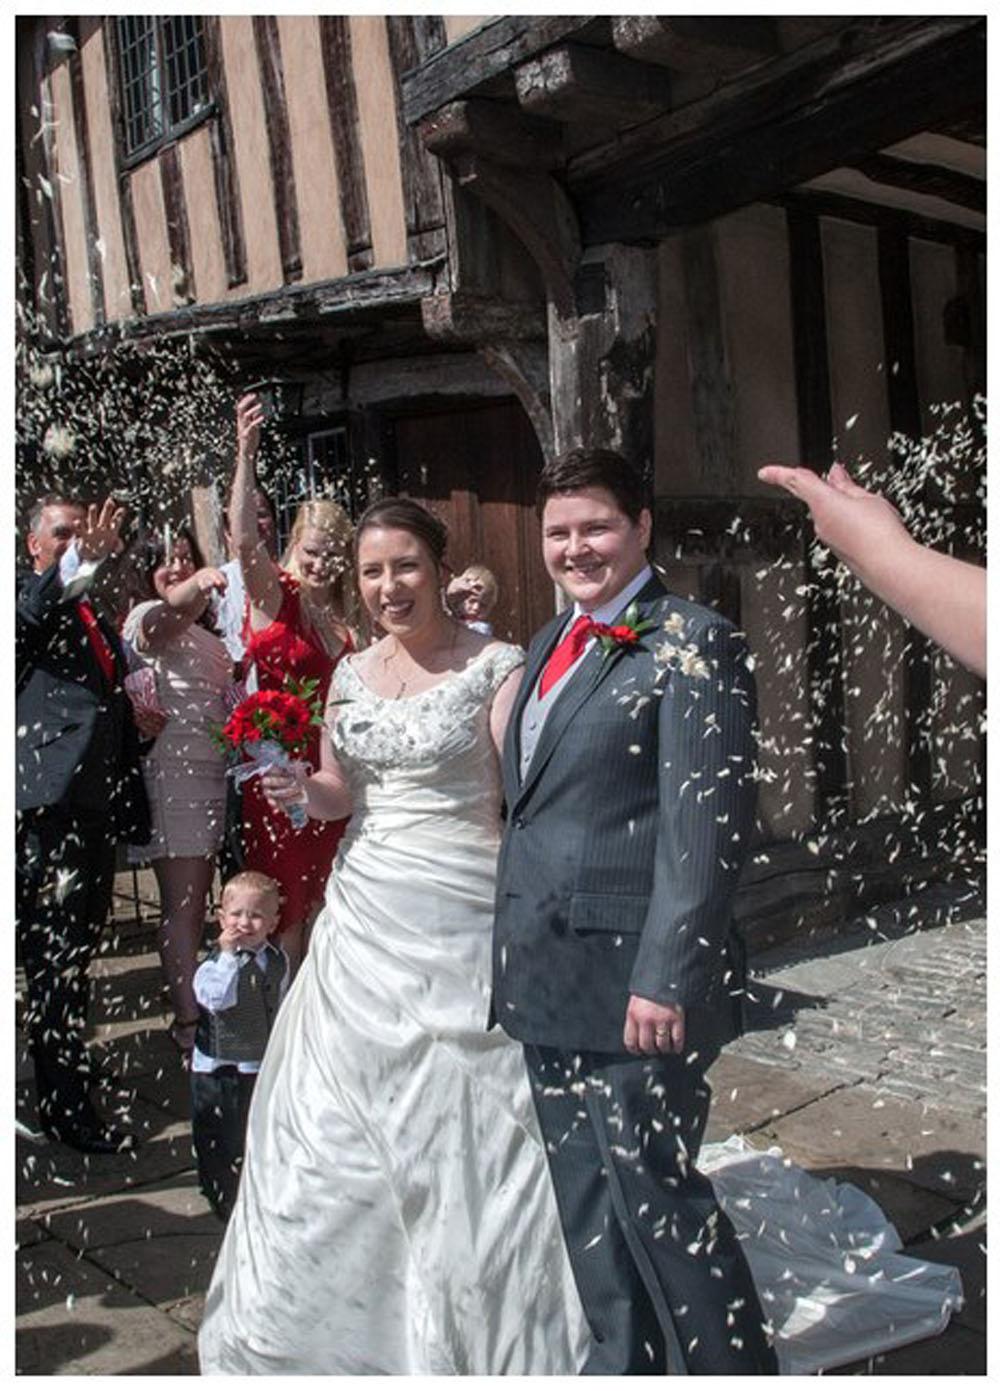 Christmas wedding confetti - ivory delphinium snow